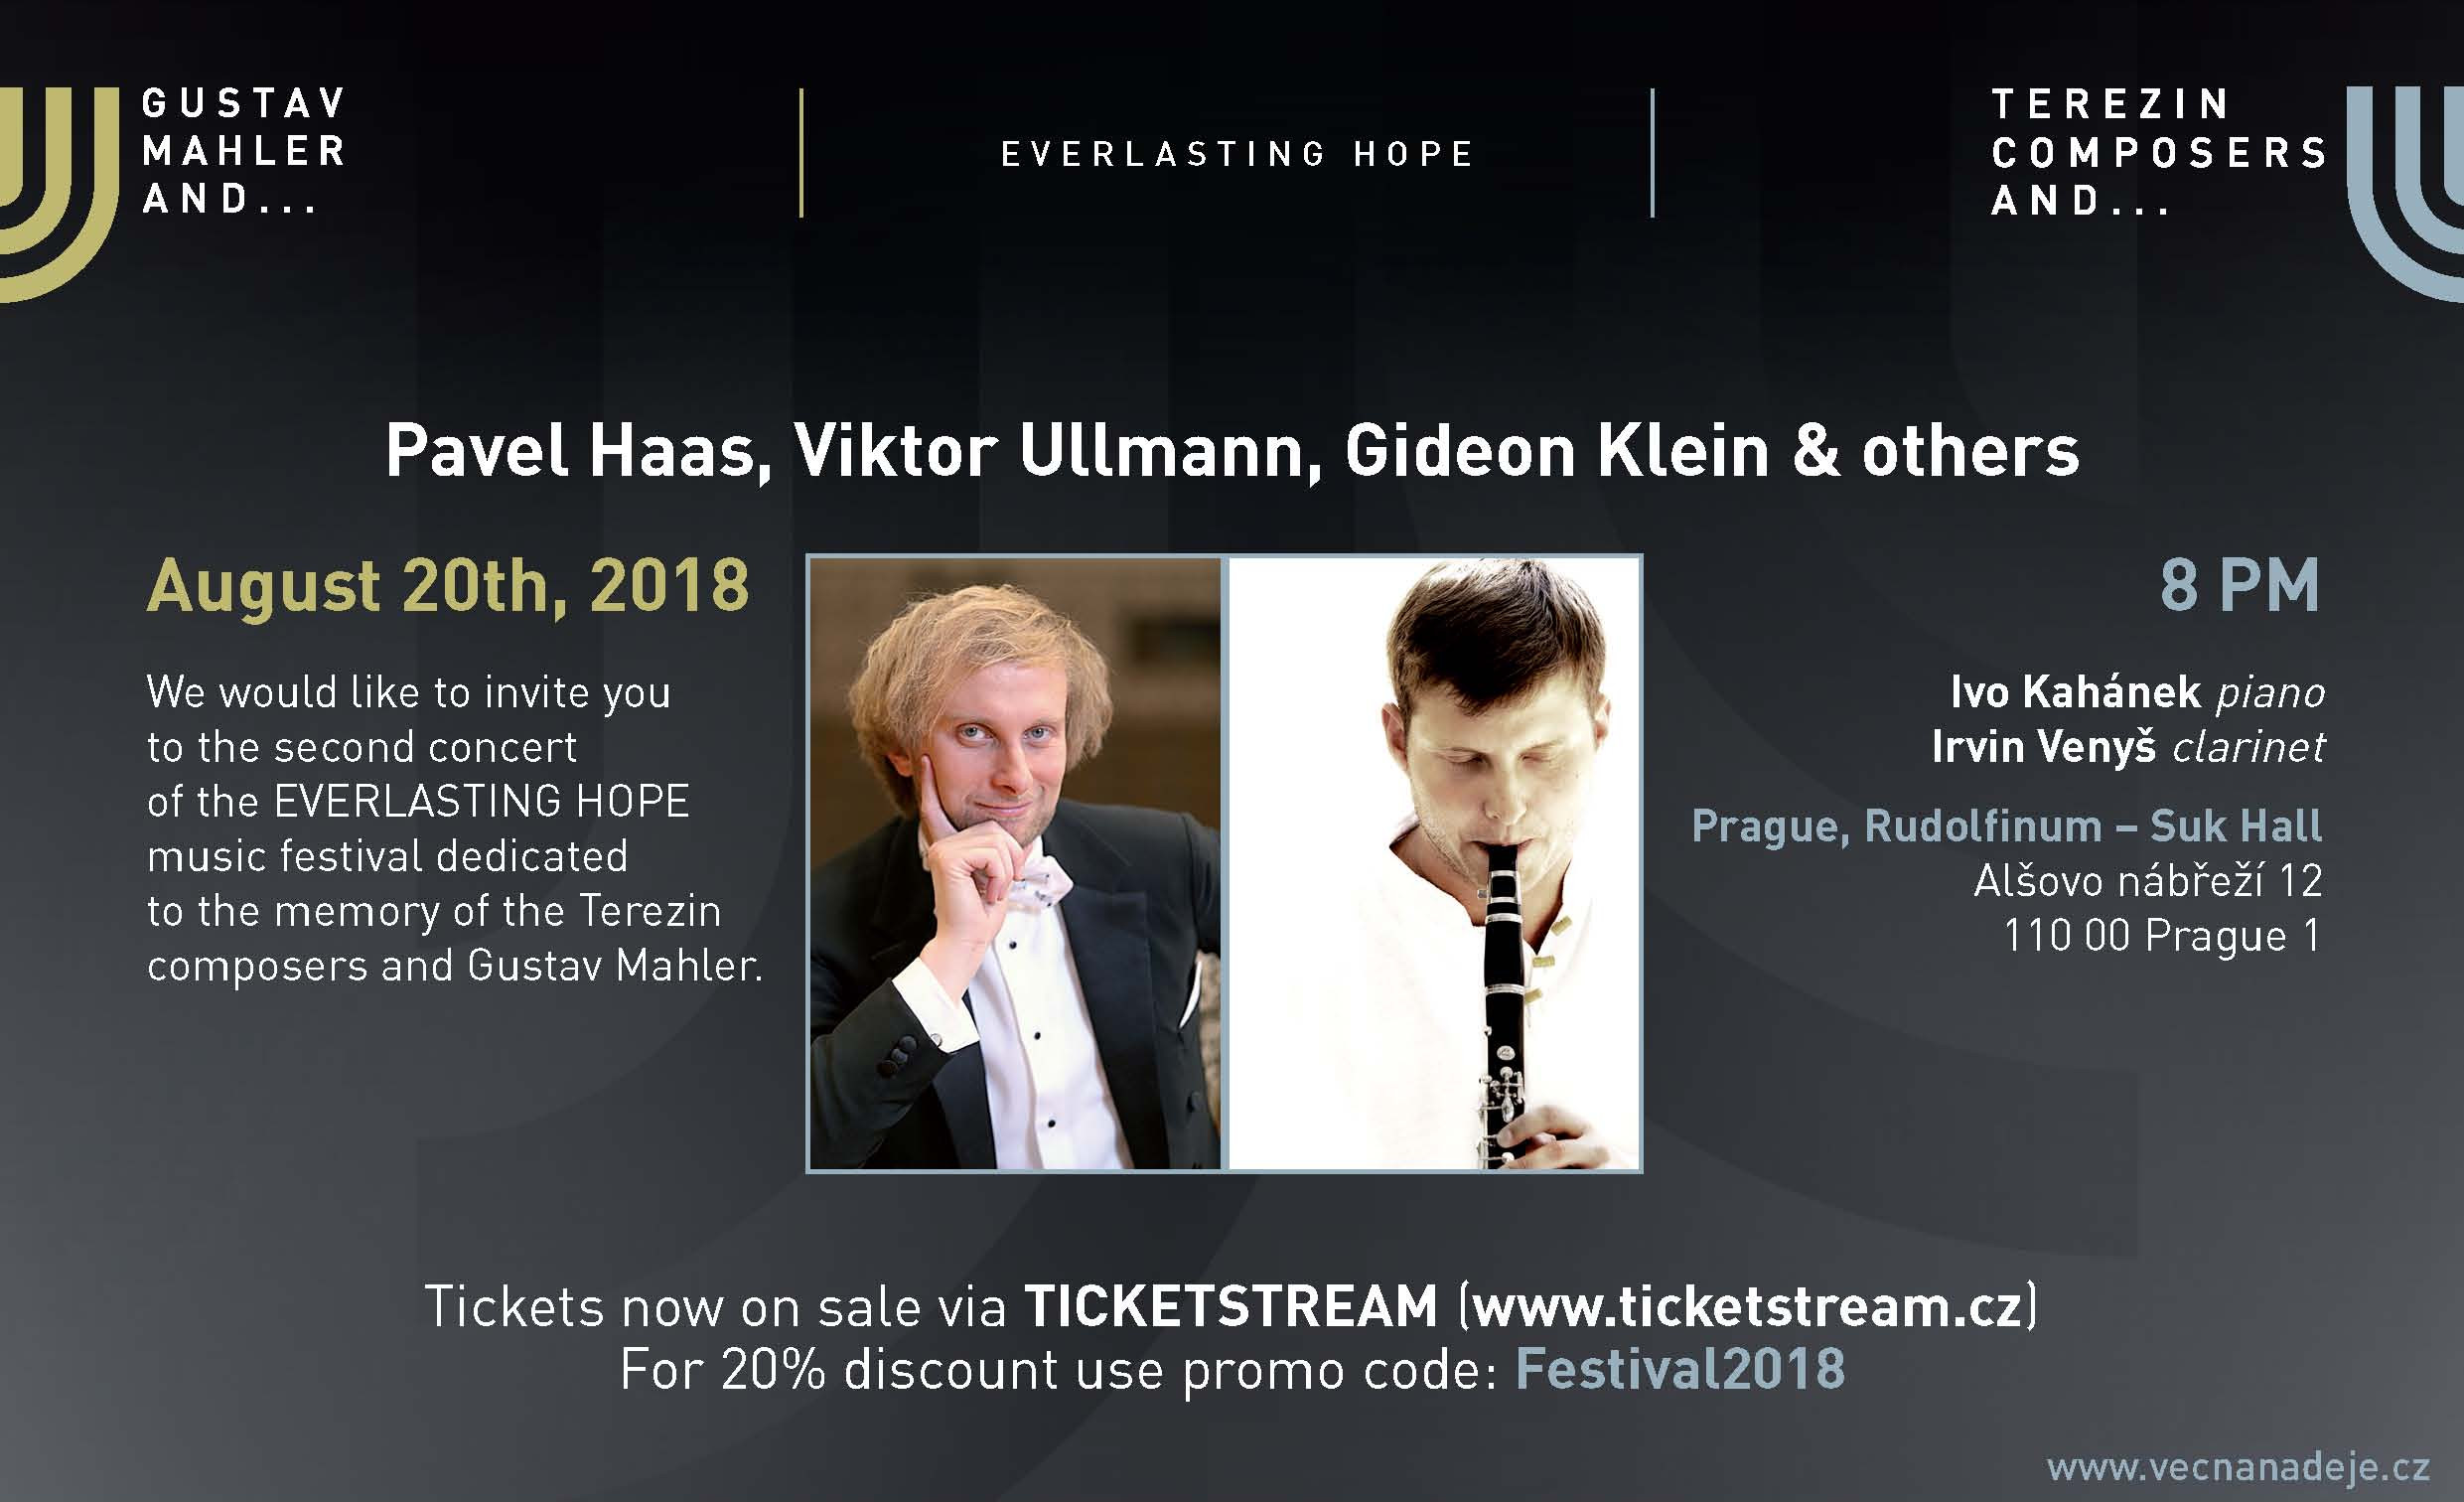 'Gustav Mahler und Theresienstädter Komponisten'